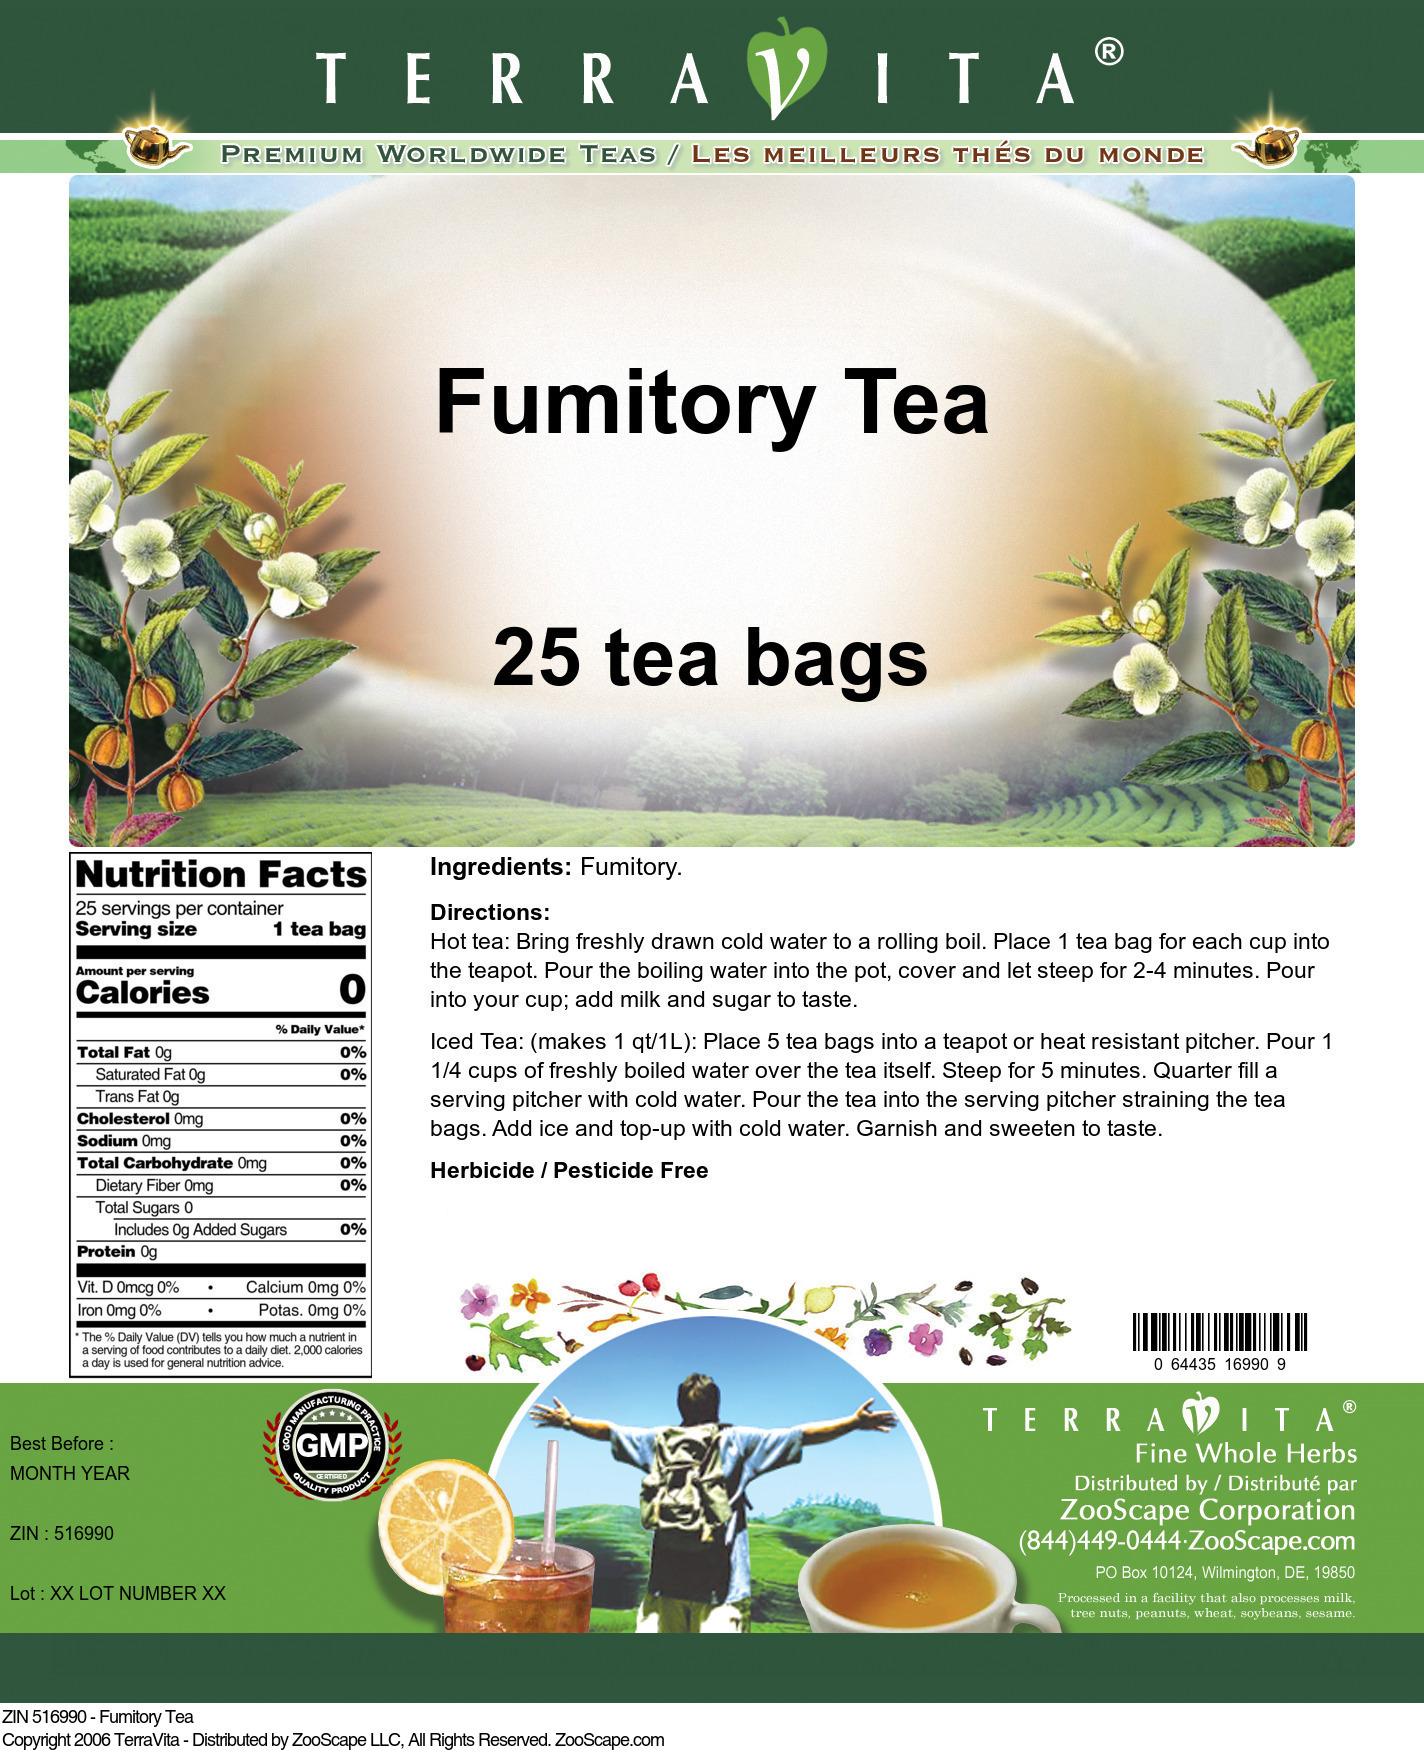 Fumitory Tea